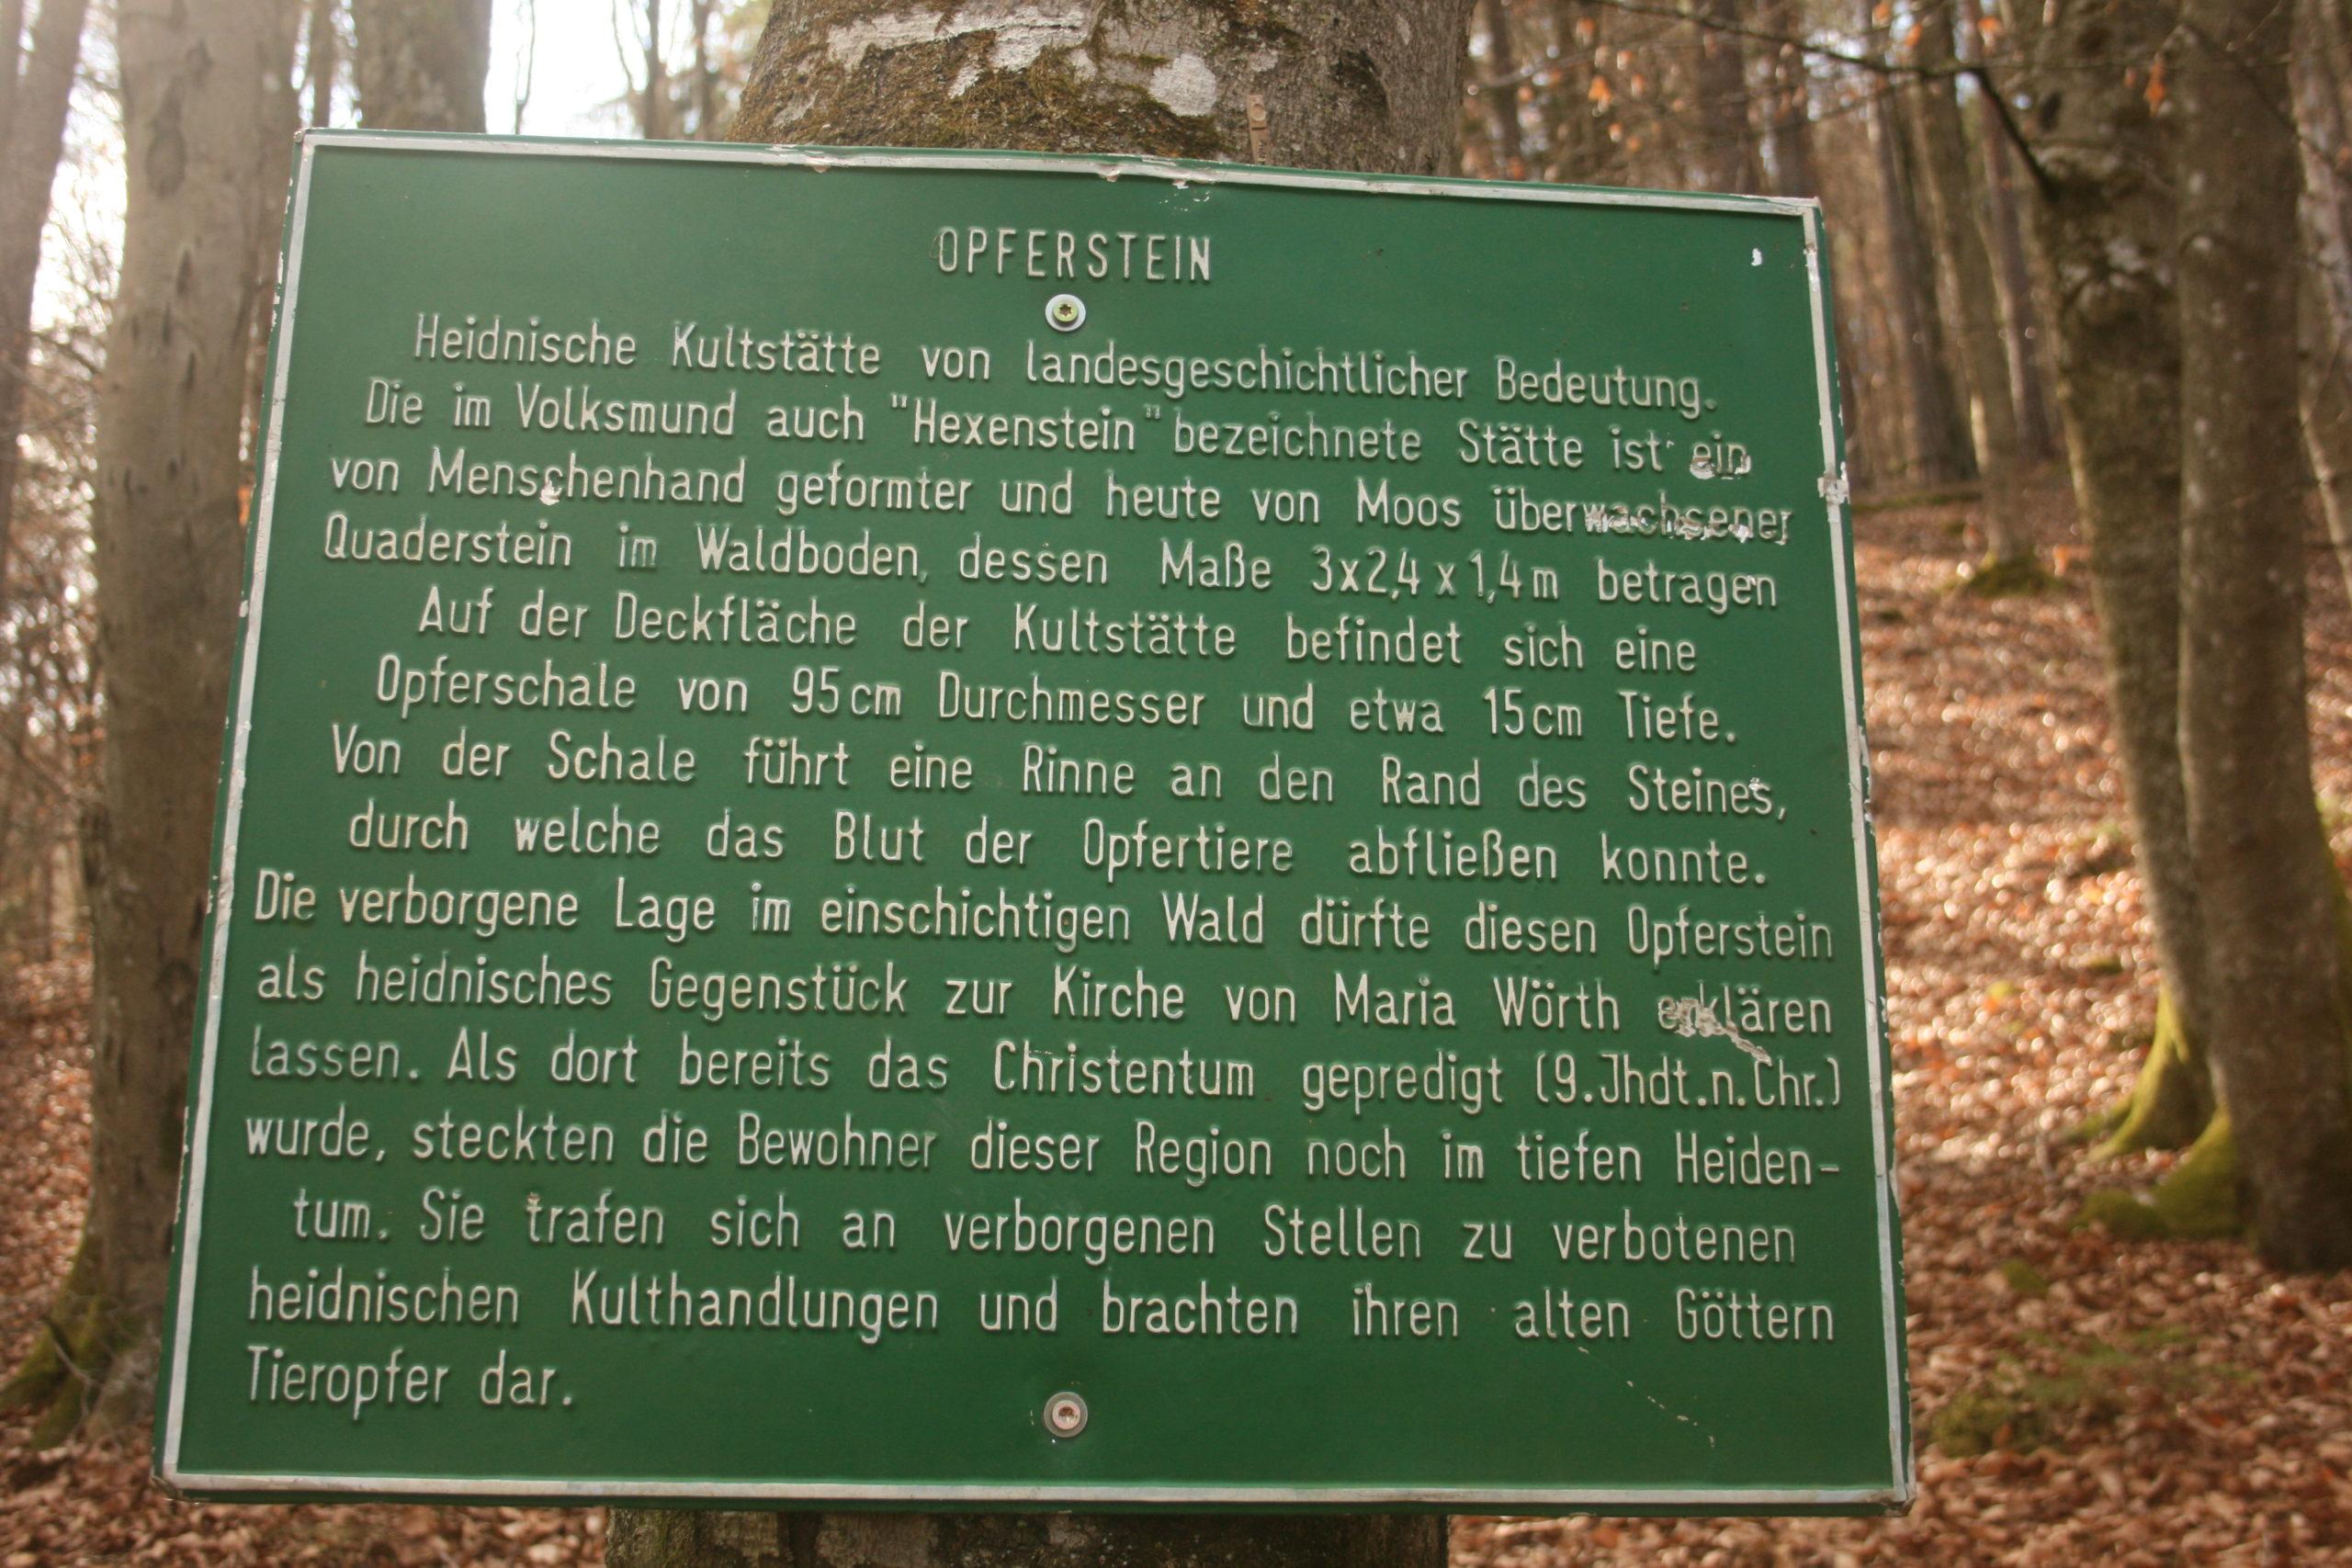 Tafel Opferstein. Foto: Birgit Frank